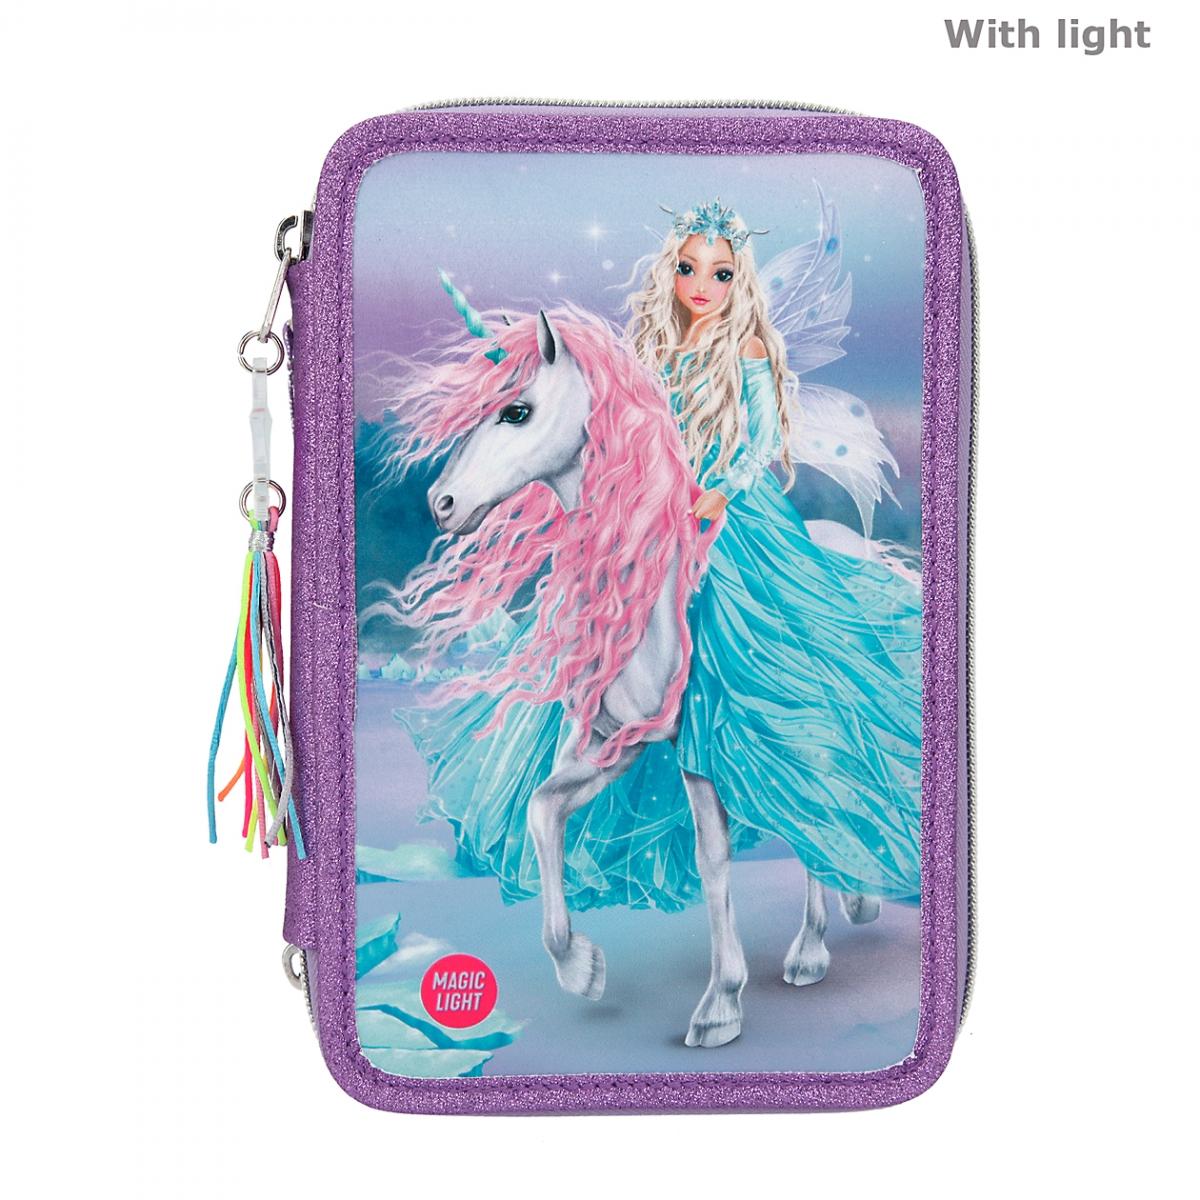 Top Model - Fantasy Trippel Pencil Case w/LED - Icefriends (11181)